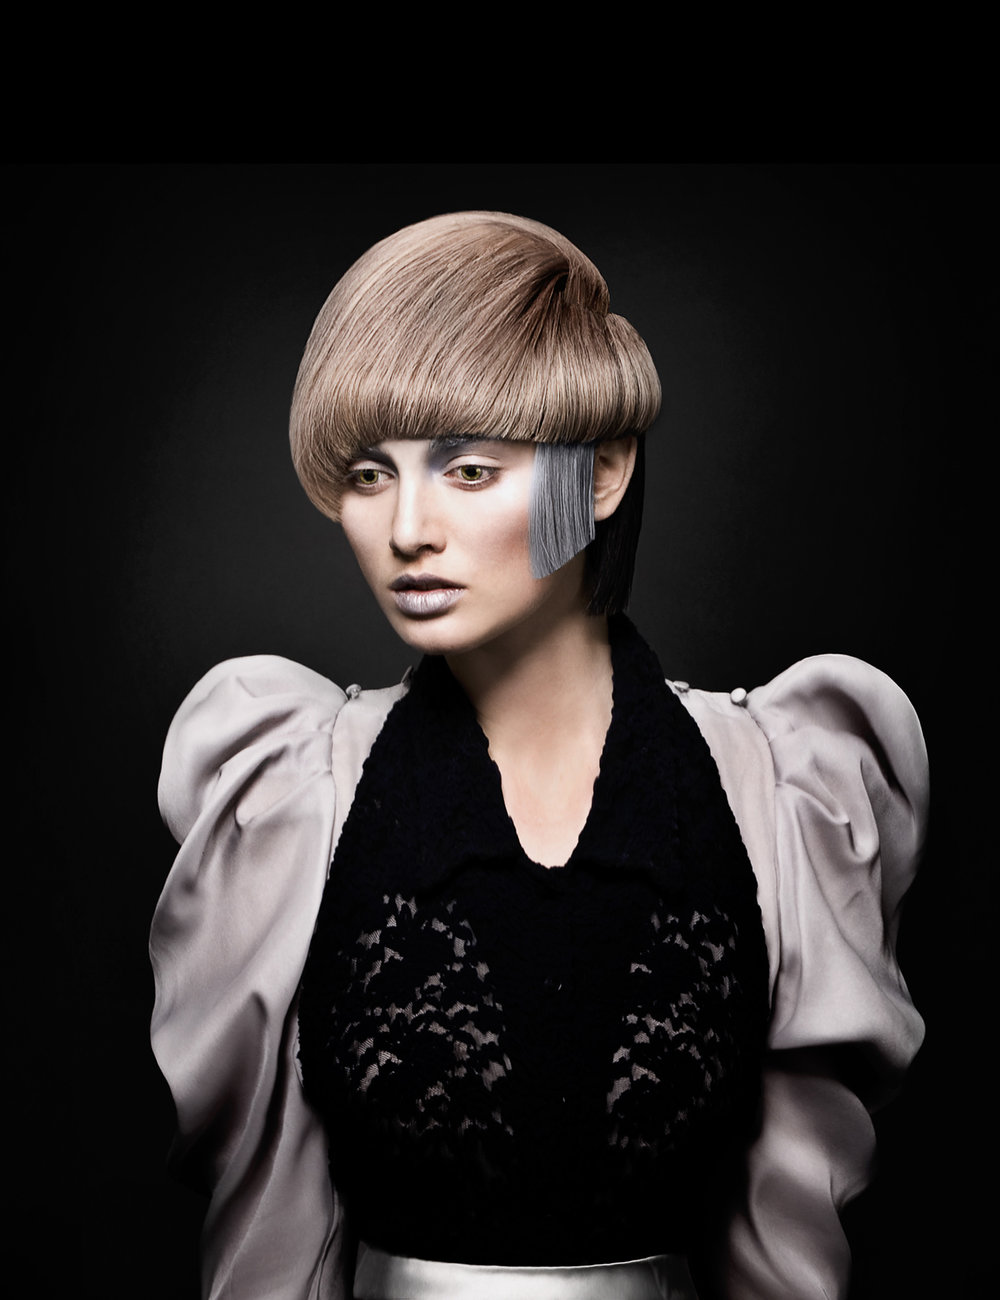 M_Alarie_Salon_Pure_HairstylistOfTheYear_04.jpg